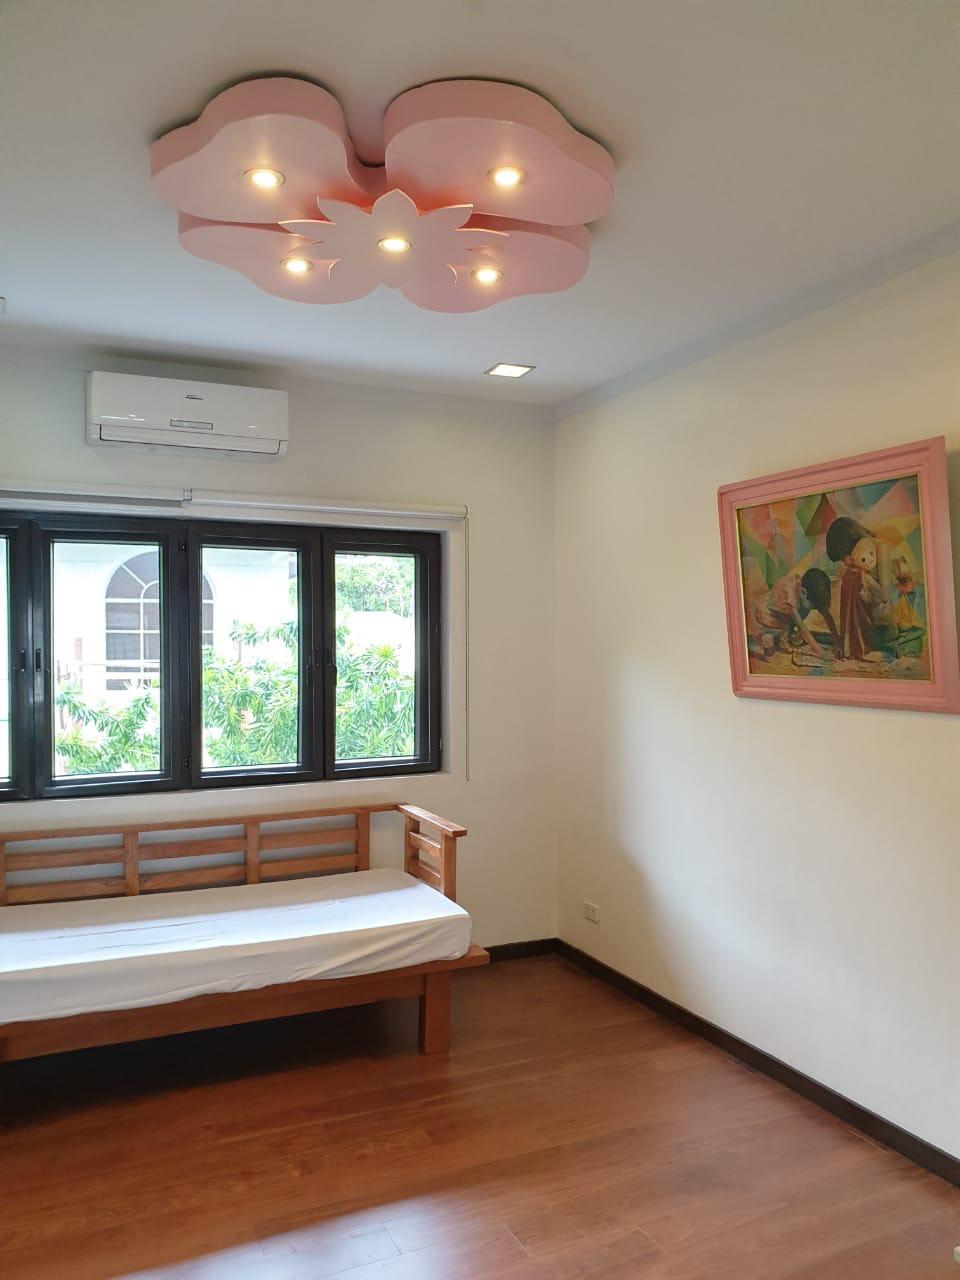 4 Bedrooms House For Sale, Ayala Alabang 7